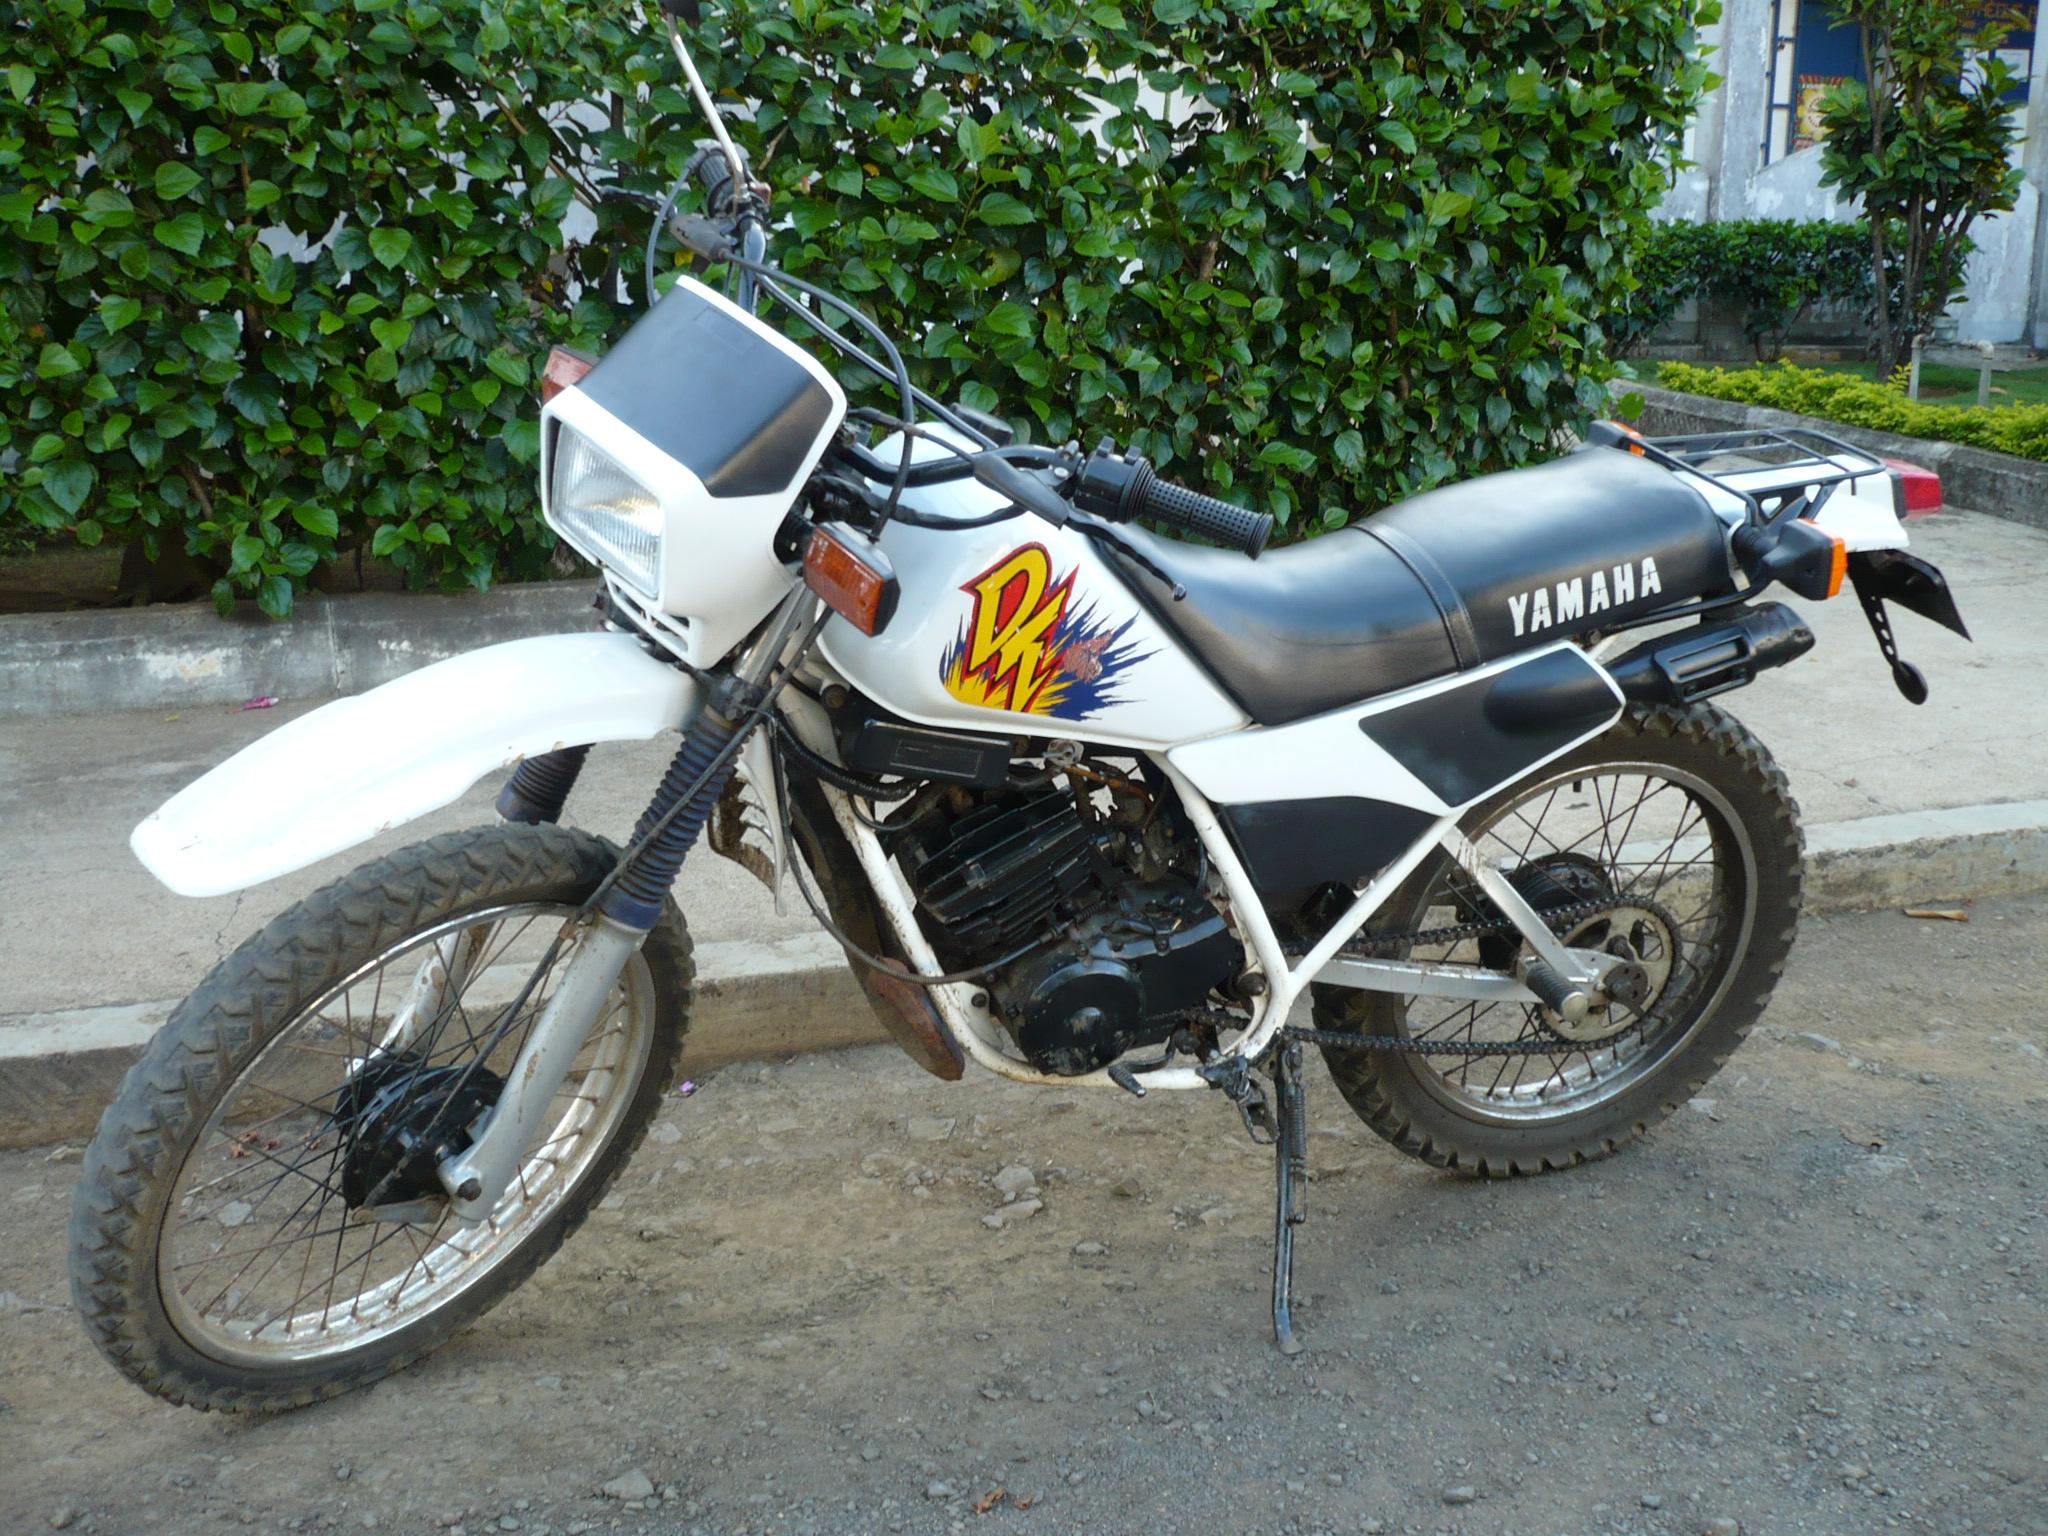 Ma petite moto qui va m'accompagner partout, j'espère...